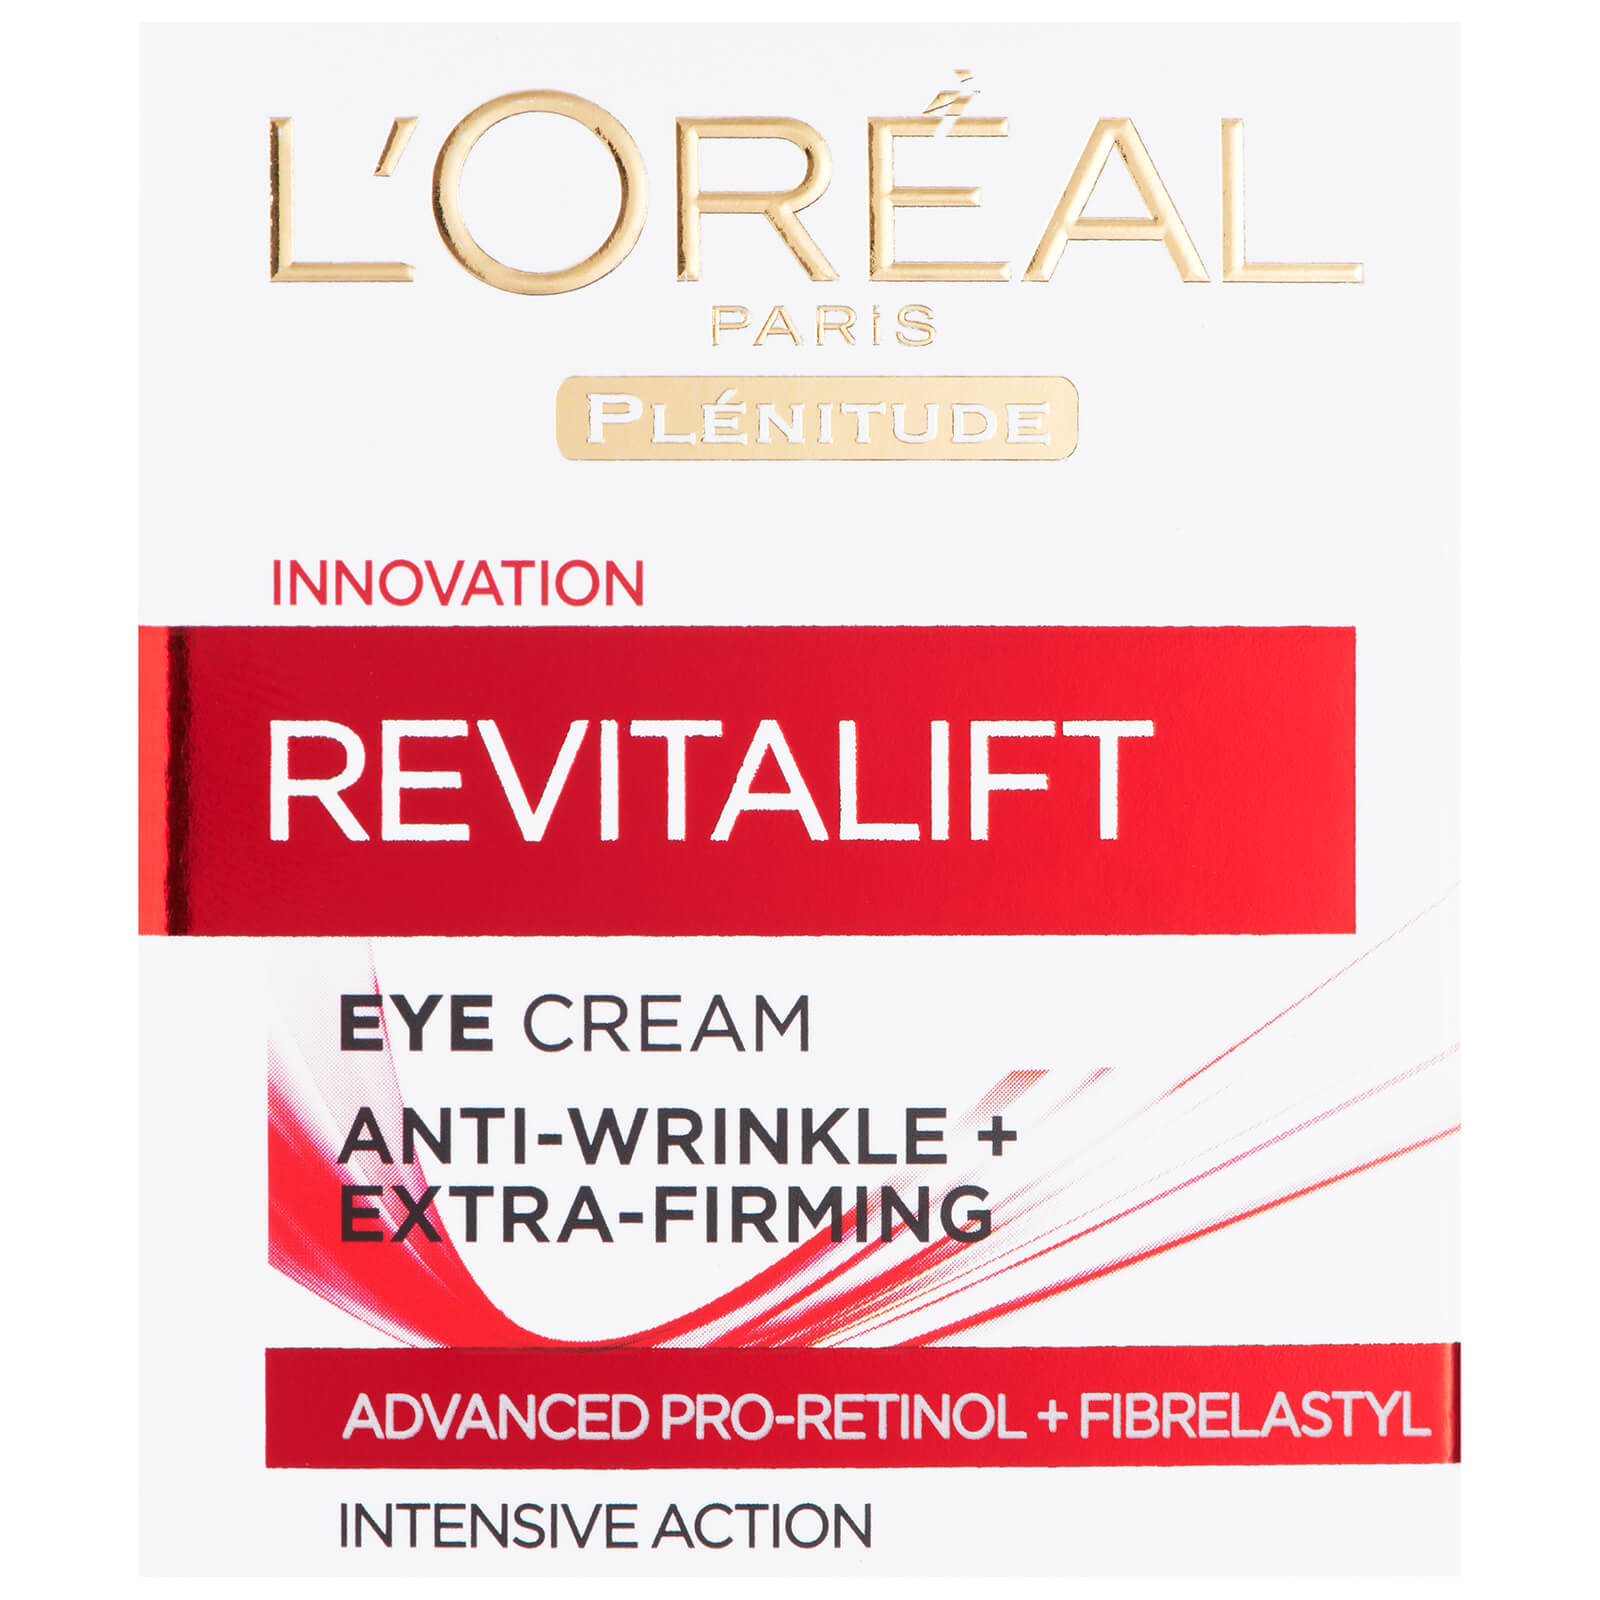 Купить Дневной крем-лифтинг кожи вокруг глаз L'Oreal Paris Dermo Expertise Revitalift Anti-Wrinkle + Firming Eye Cream (15 мл)